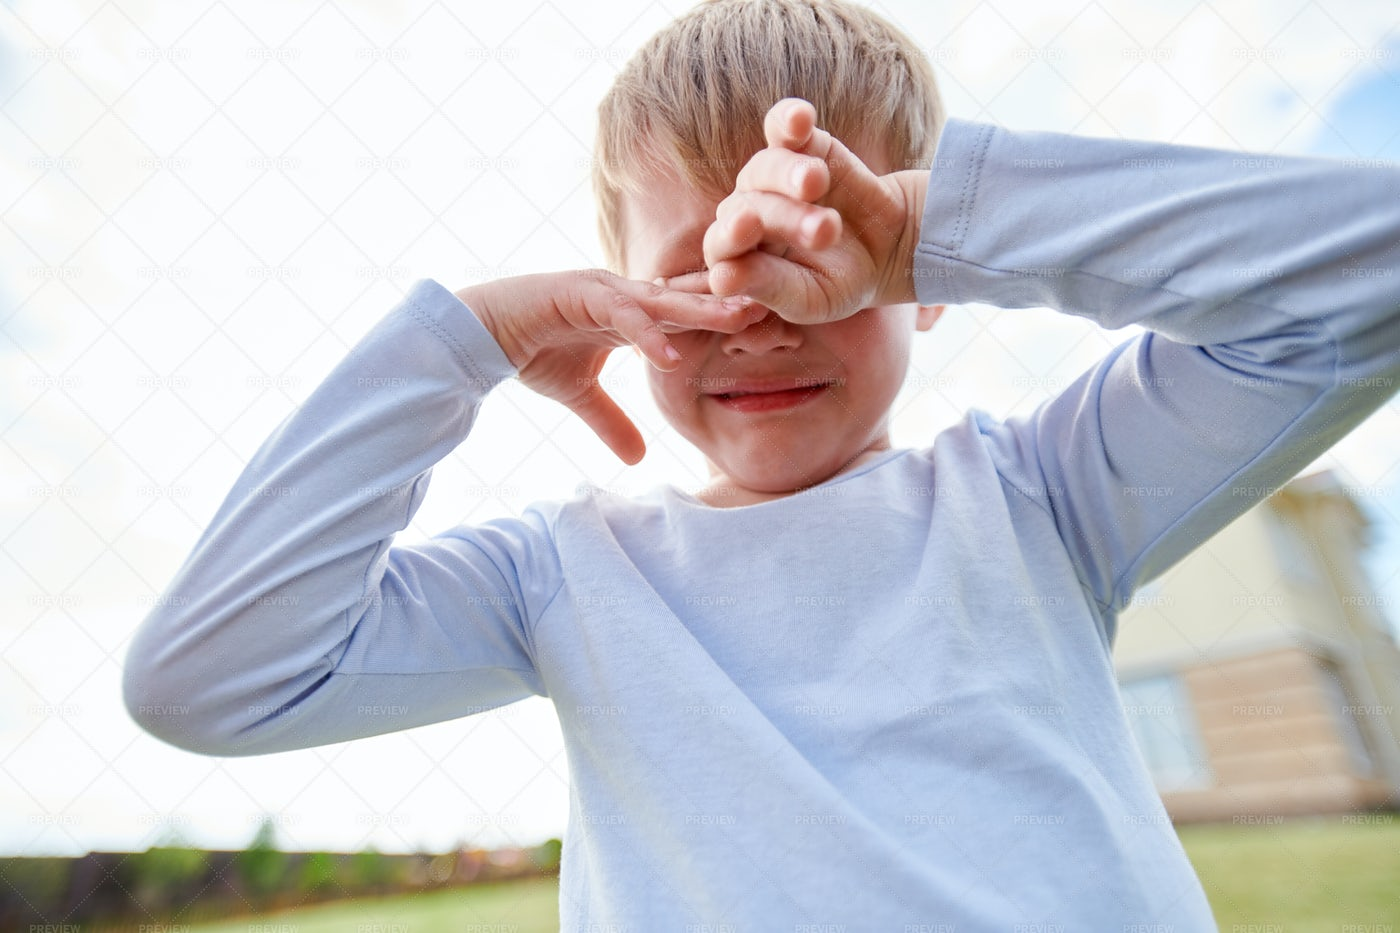 Crying Little Boy On Playground: Stock Photos